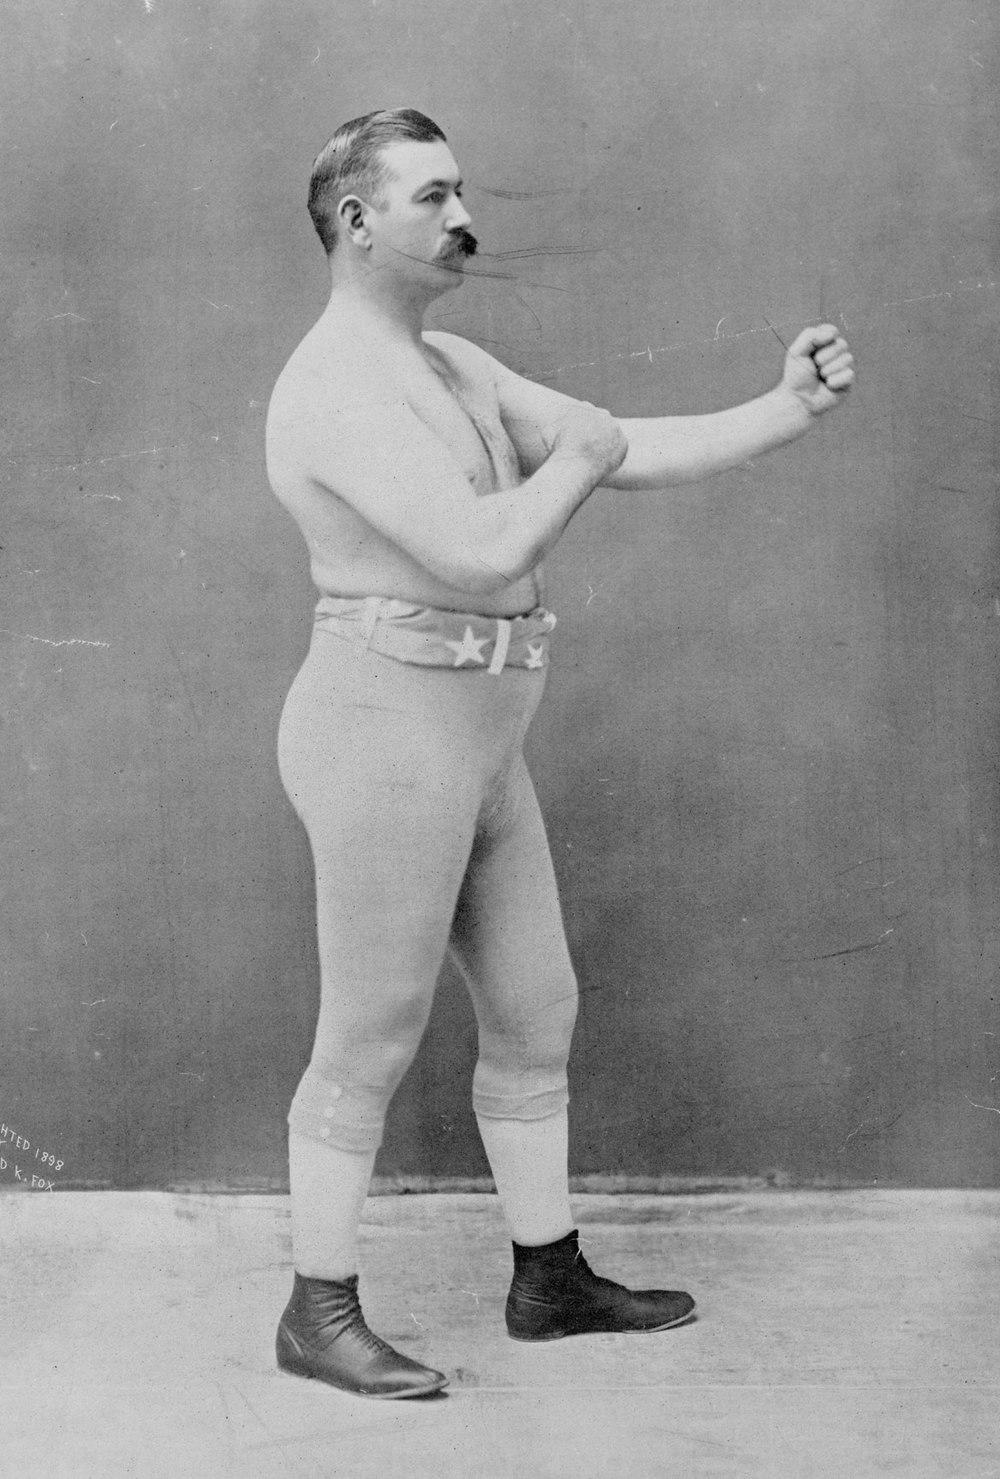 John L. Sullivan, circa 1898. Courtesy Wikipedia Commons